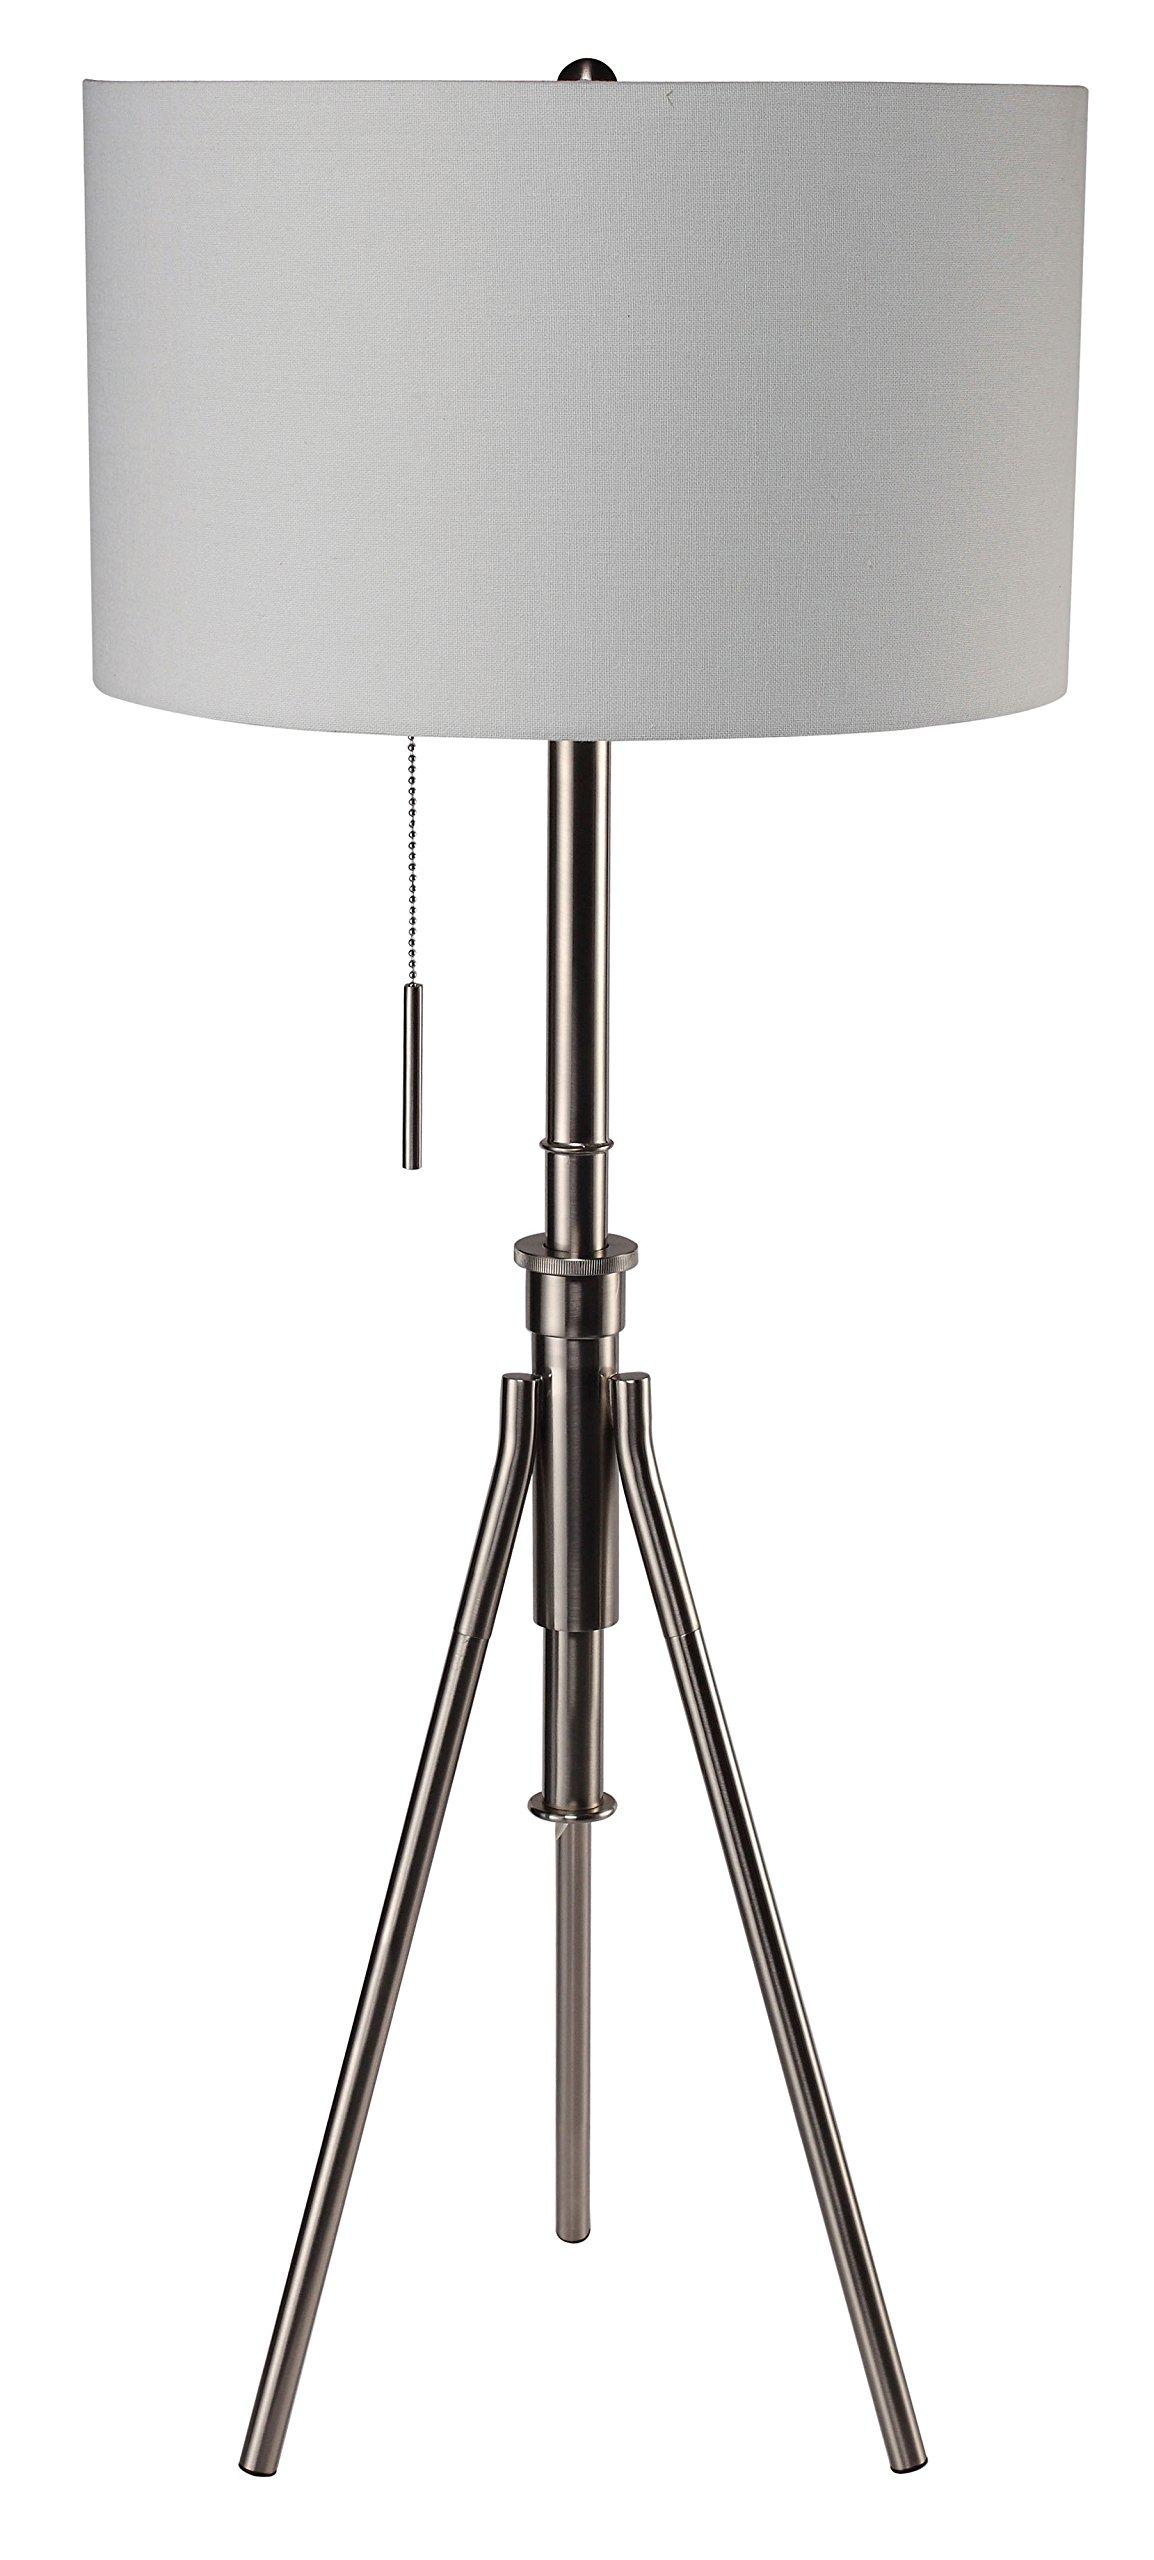 Furniture of America Lumi Tripod Floor Lamp Contemporary Style - Silver by Furniture of America